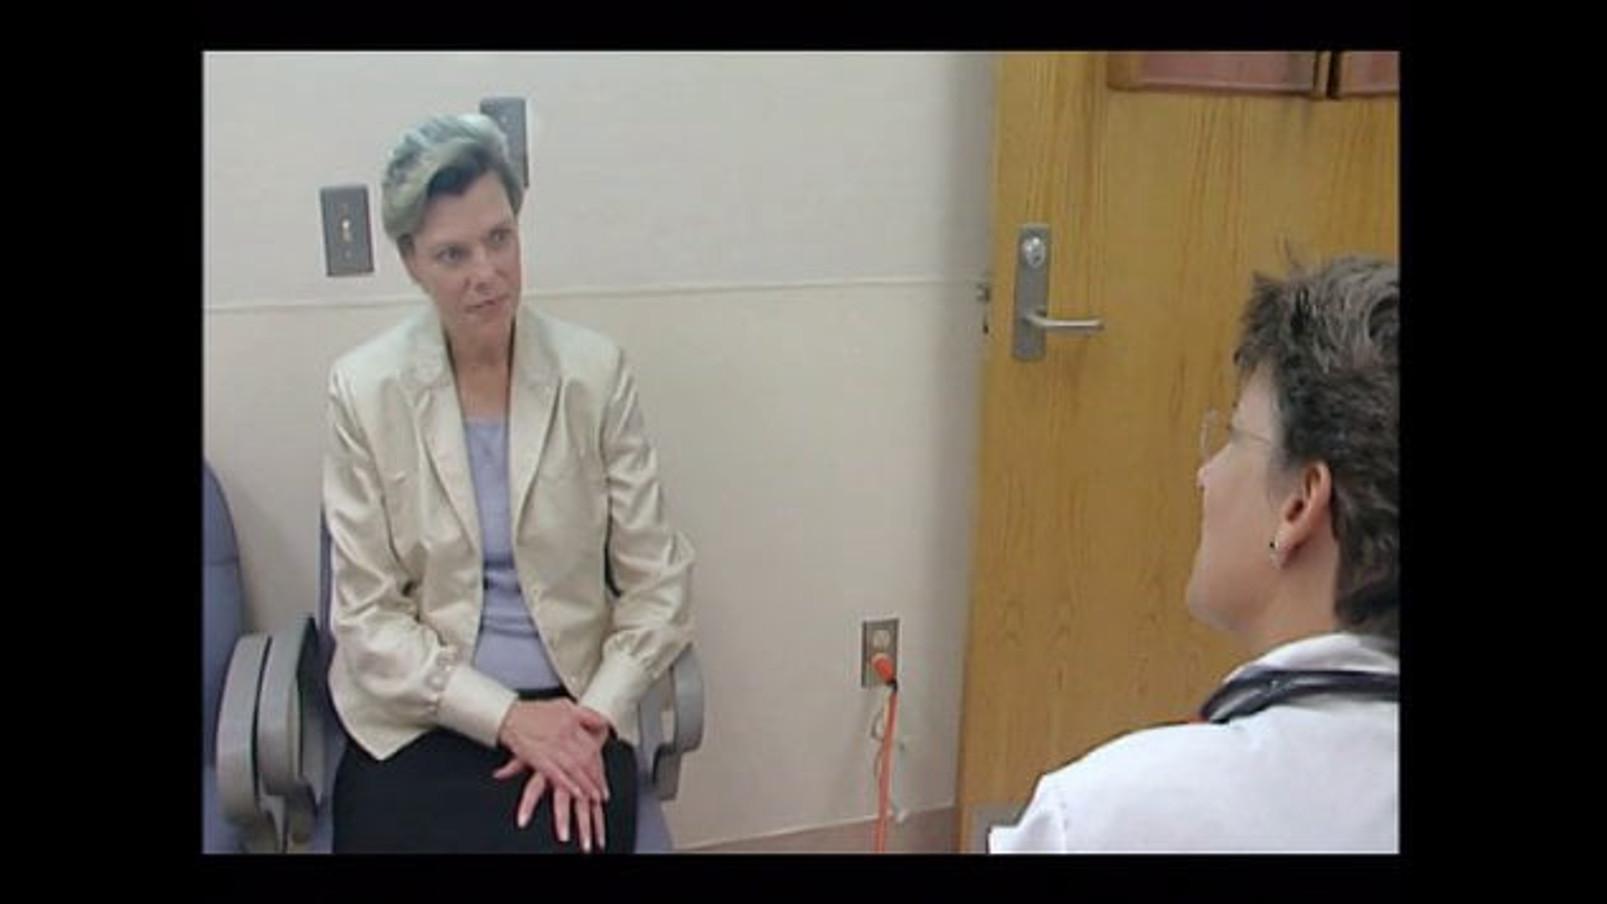 Visionaries - Clinical Trials.gov